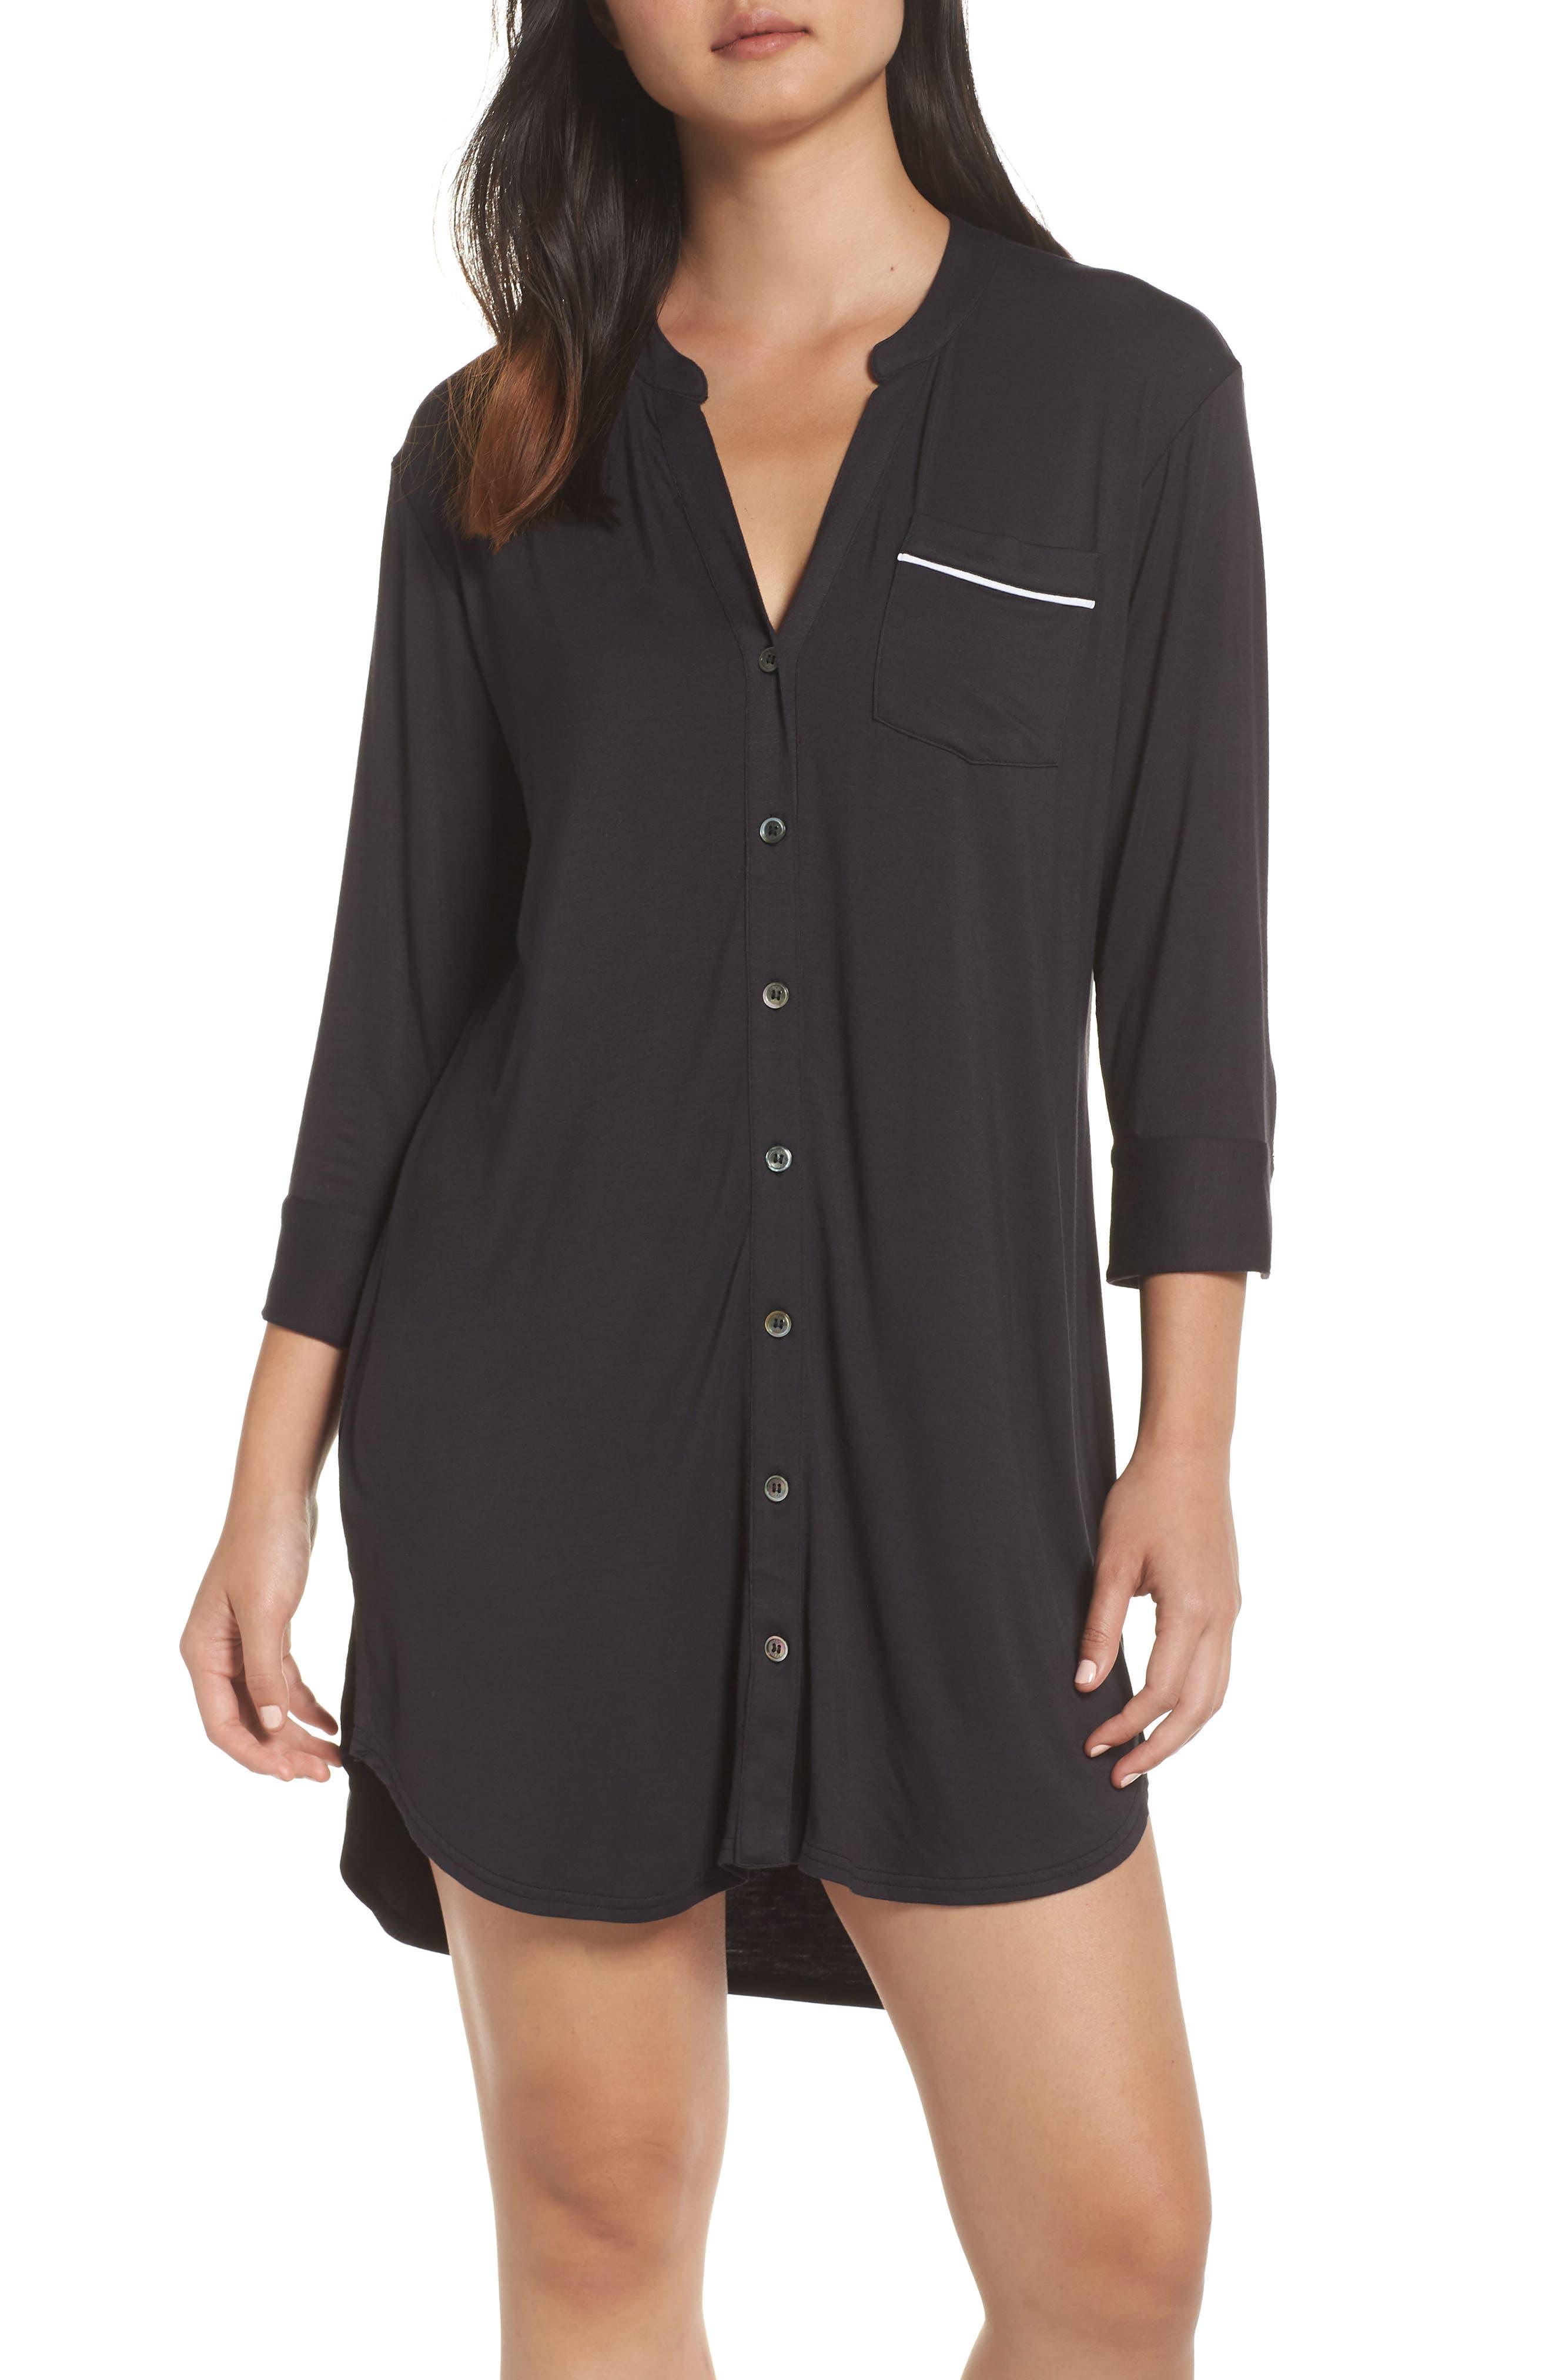 Ugg Vivian Sleep Shirt, Black